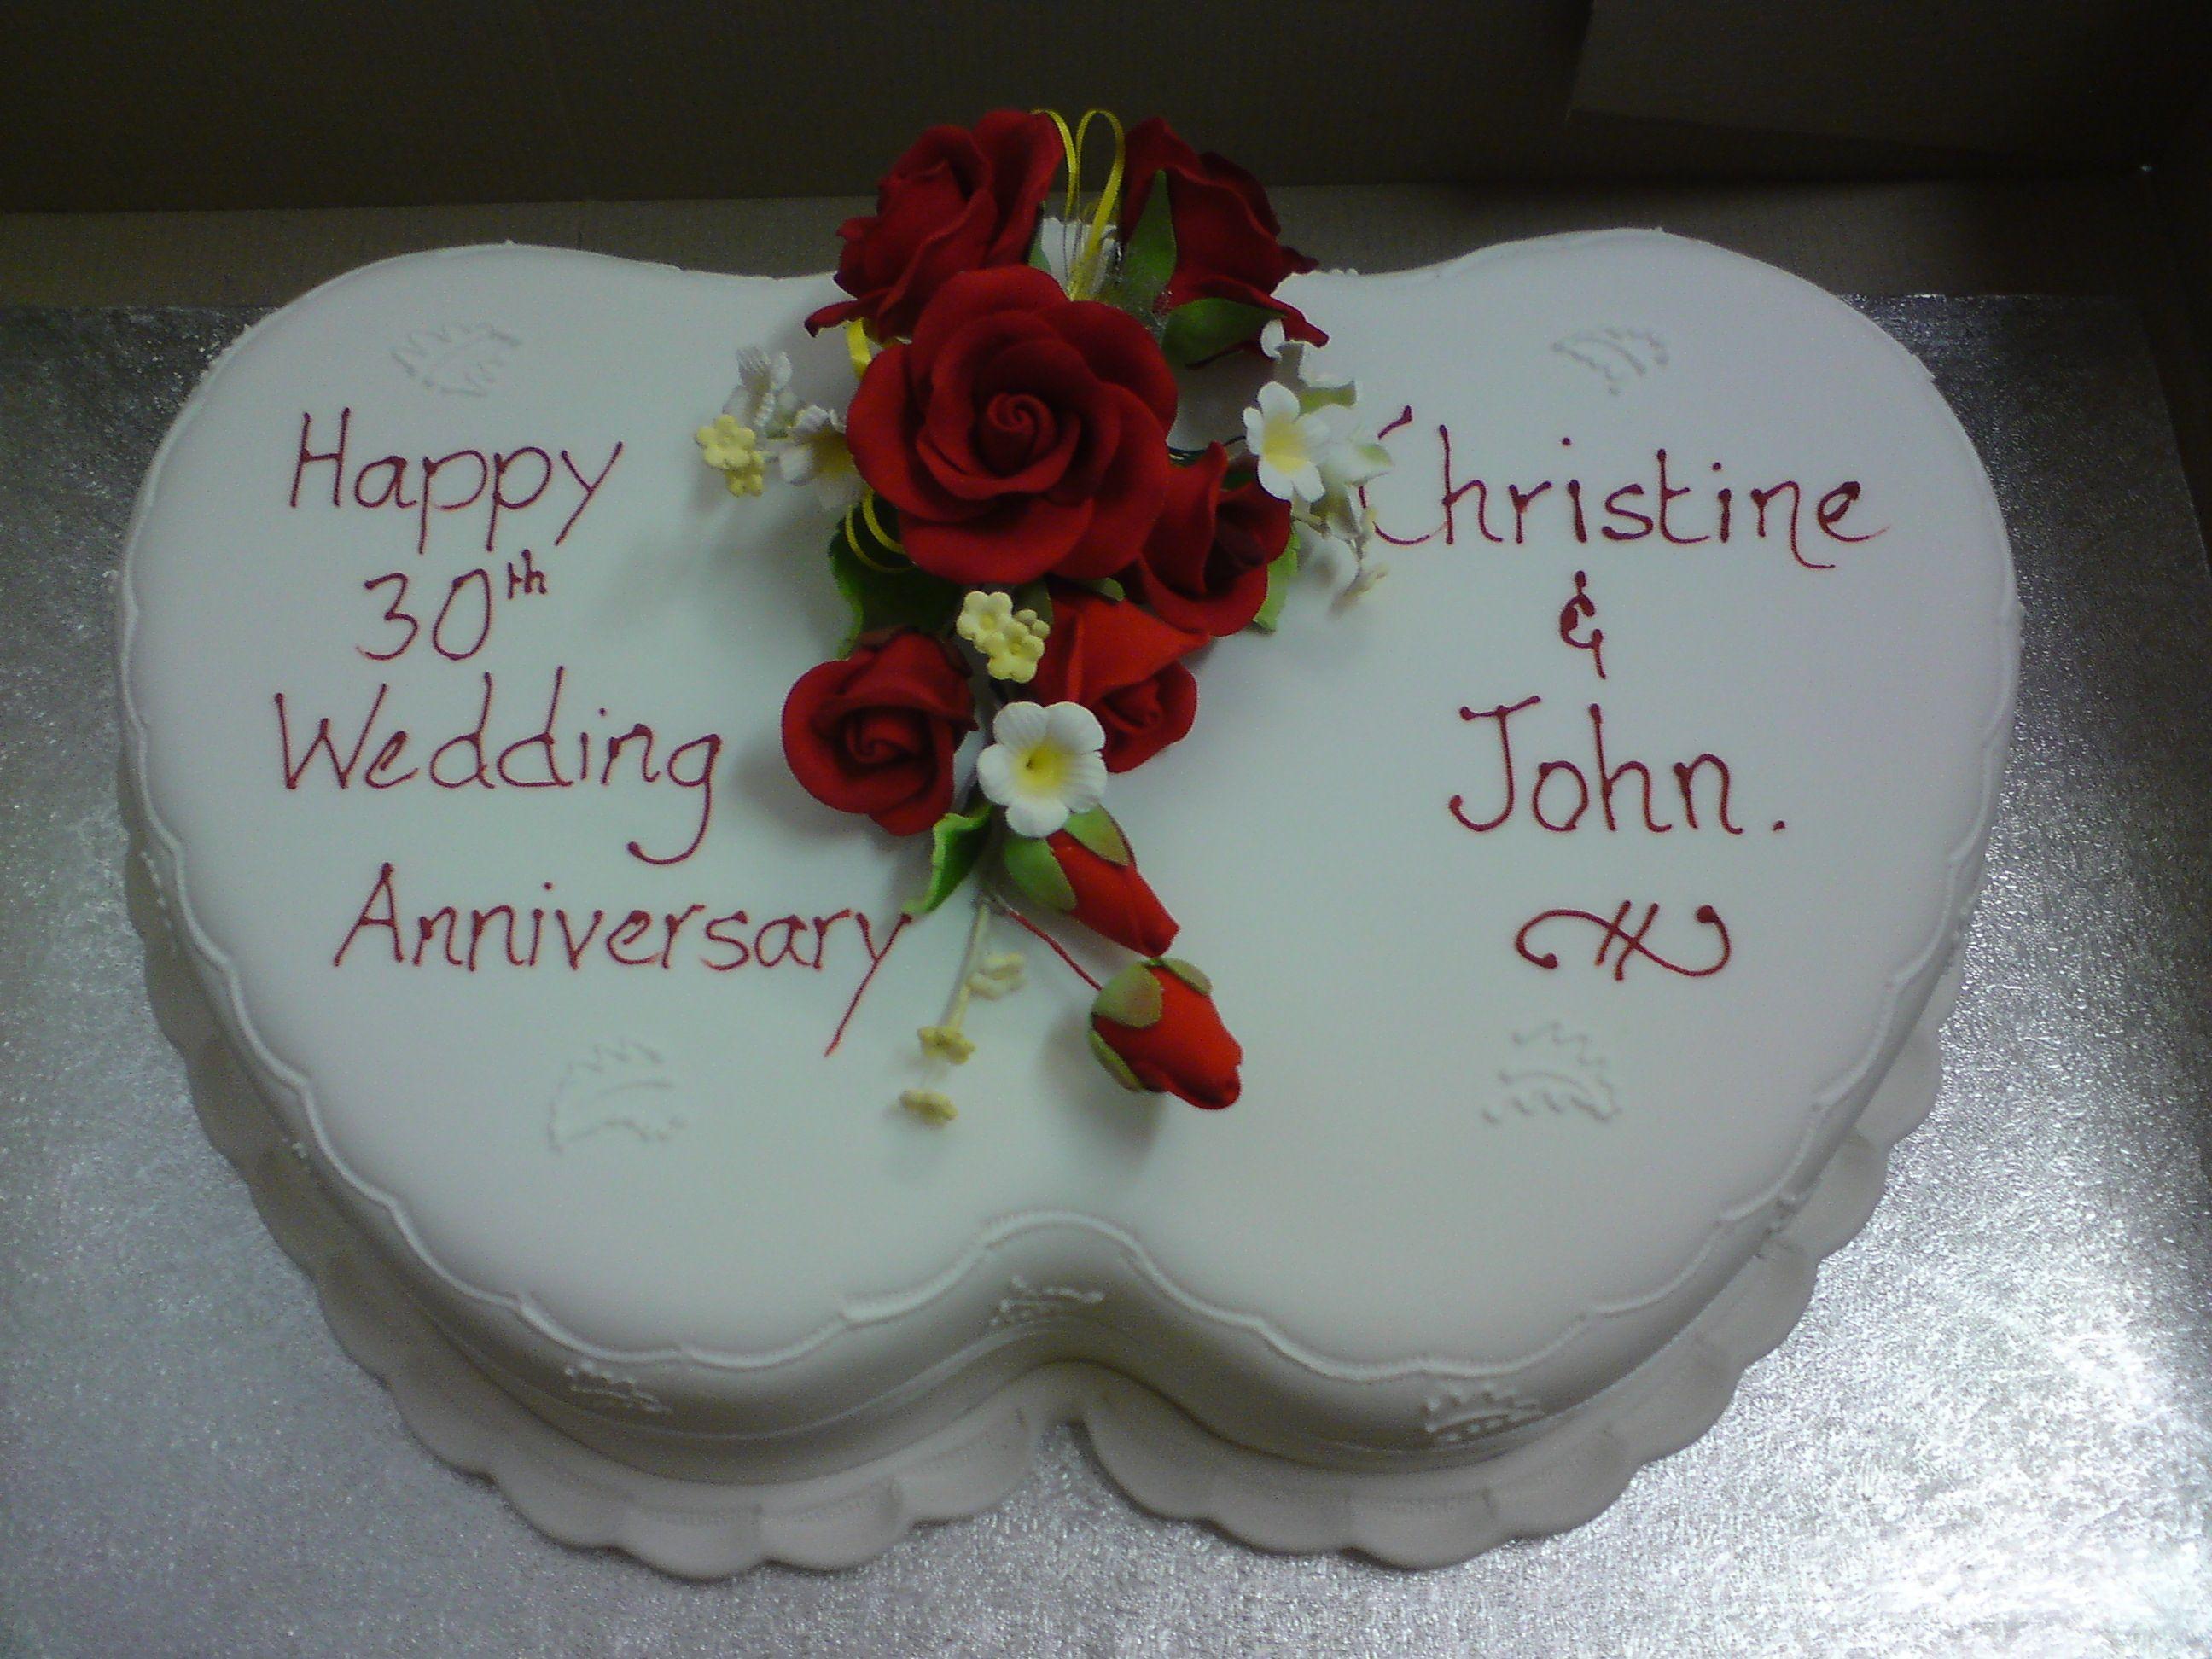 Wedding anniversary cake messages